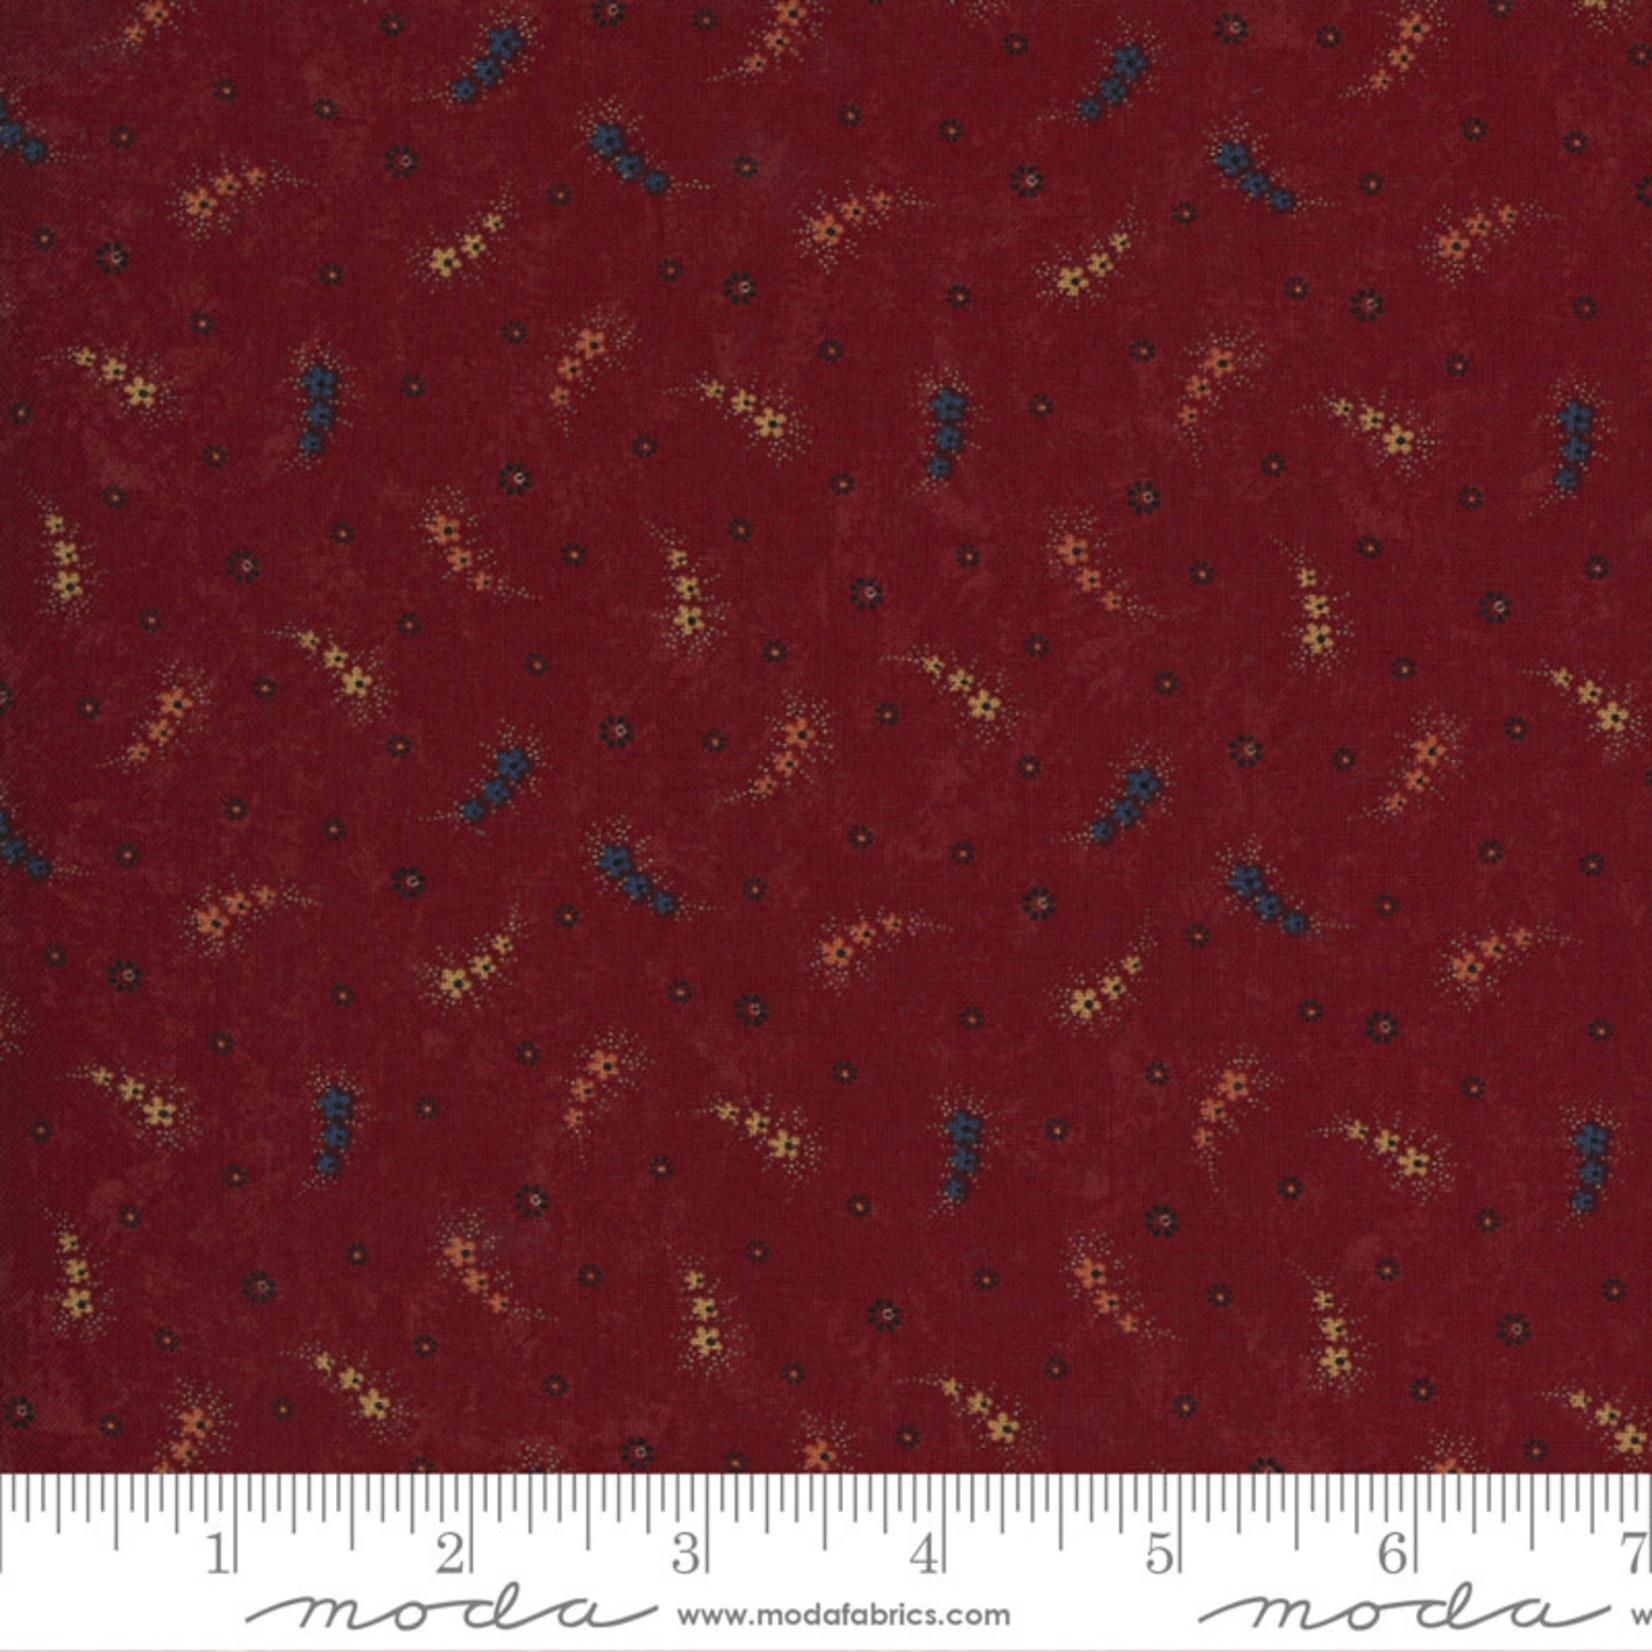 Kansas Troubles Quilters Prairie Dreams, Daisy Chain, Red 9651 13 $0.20 per cm or $20/m